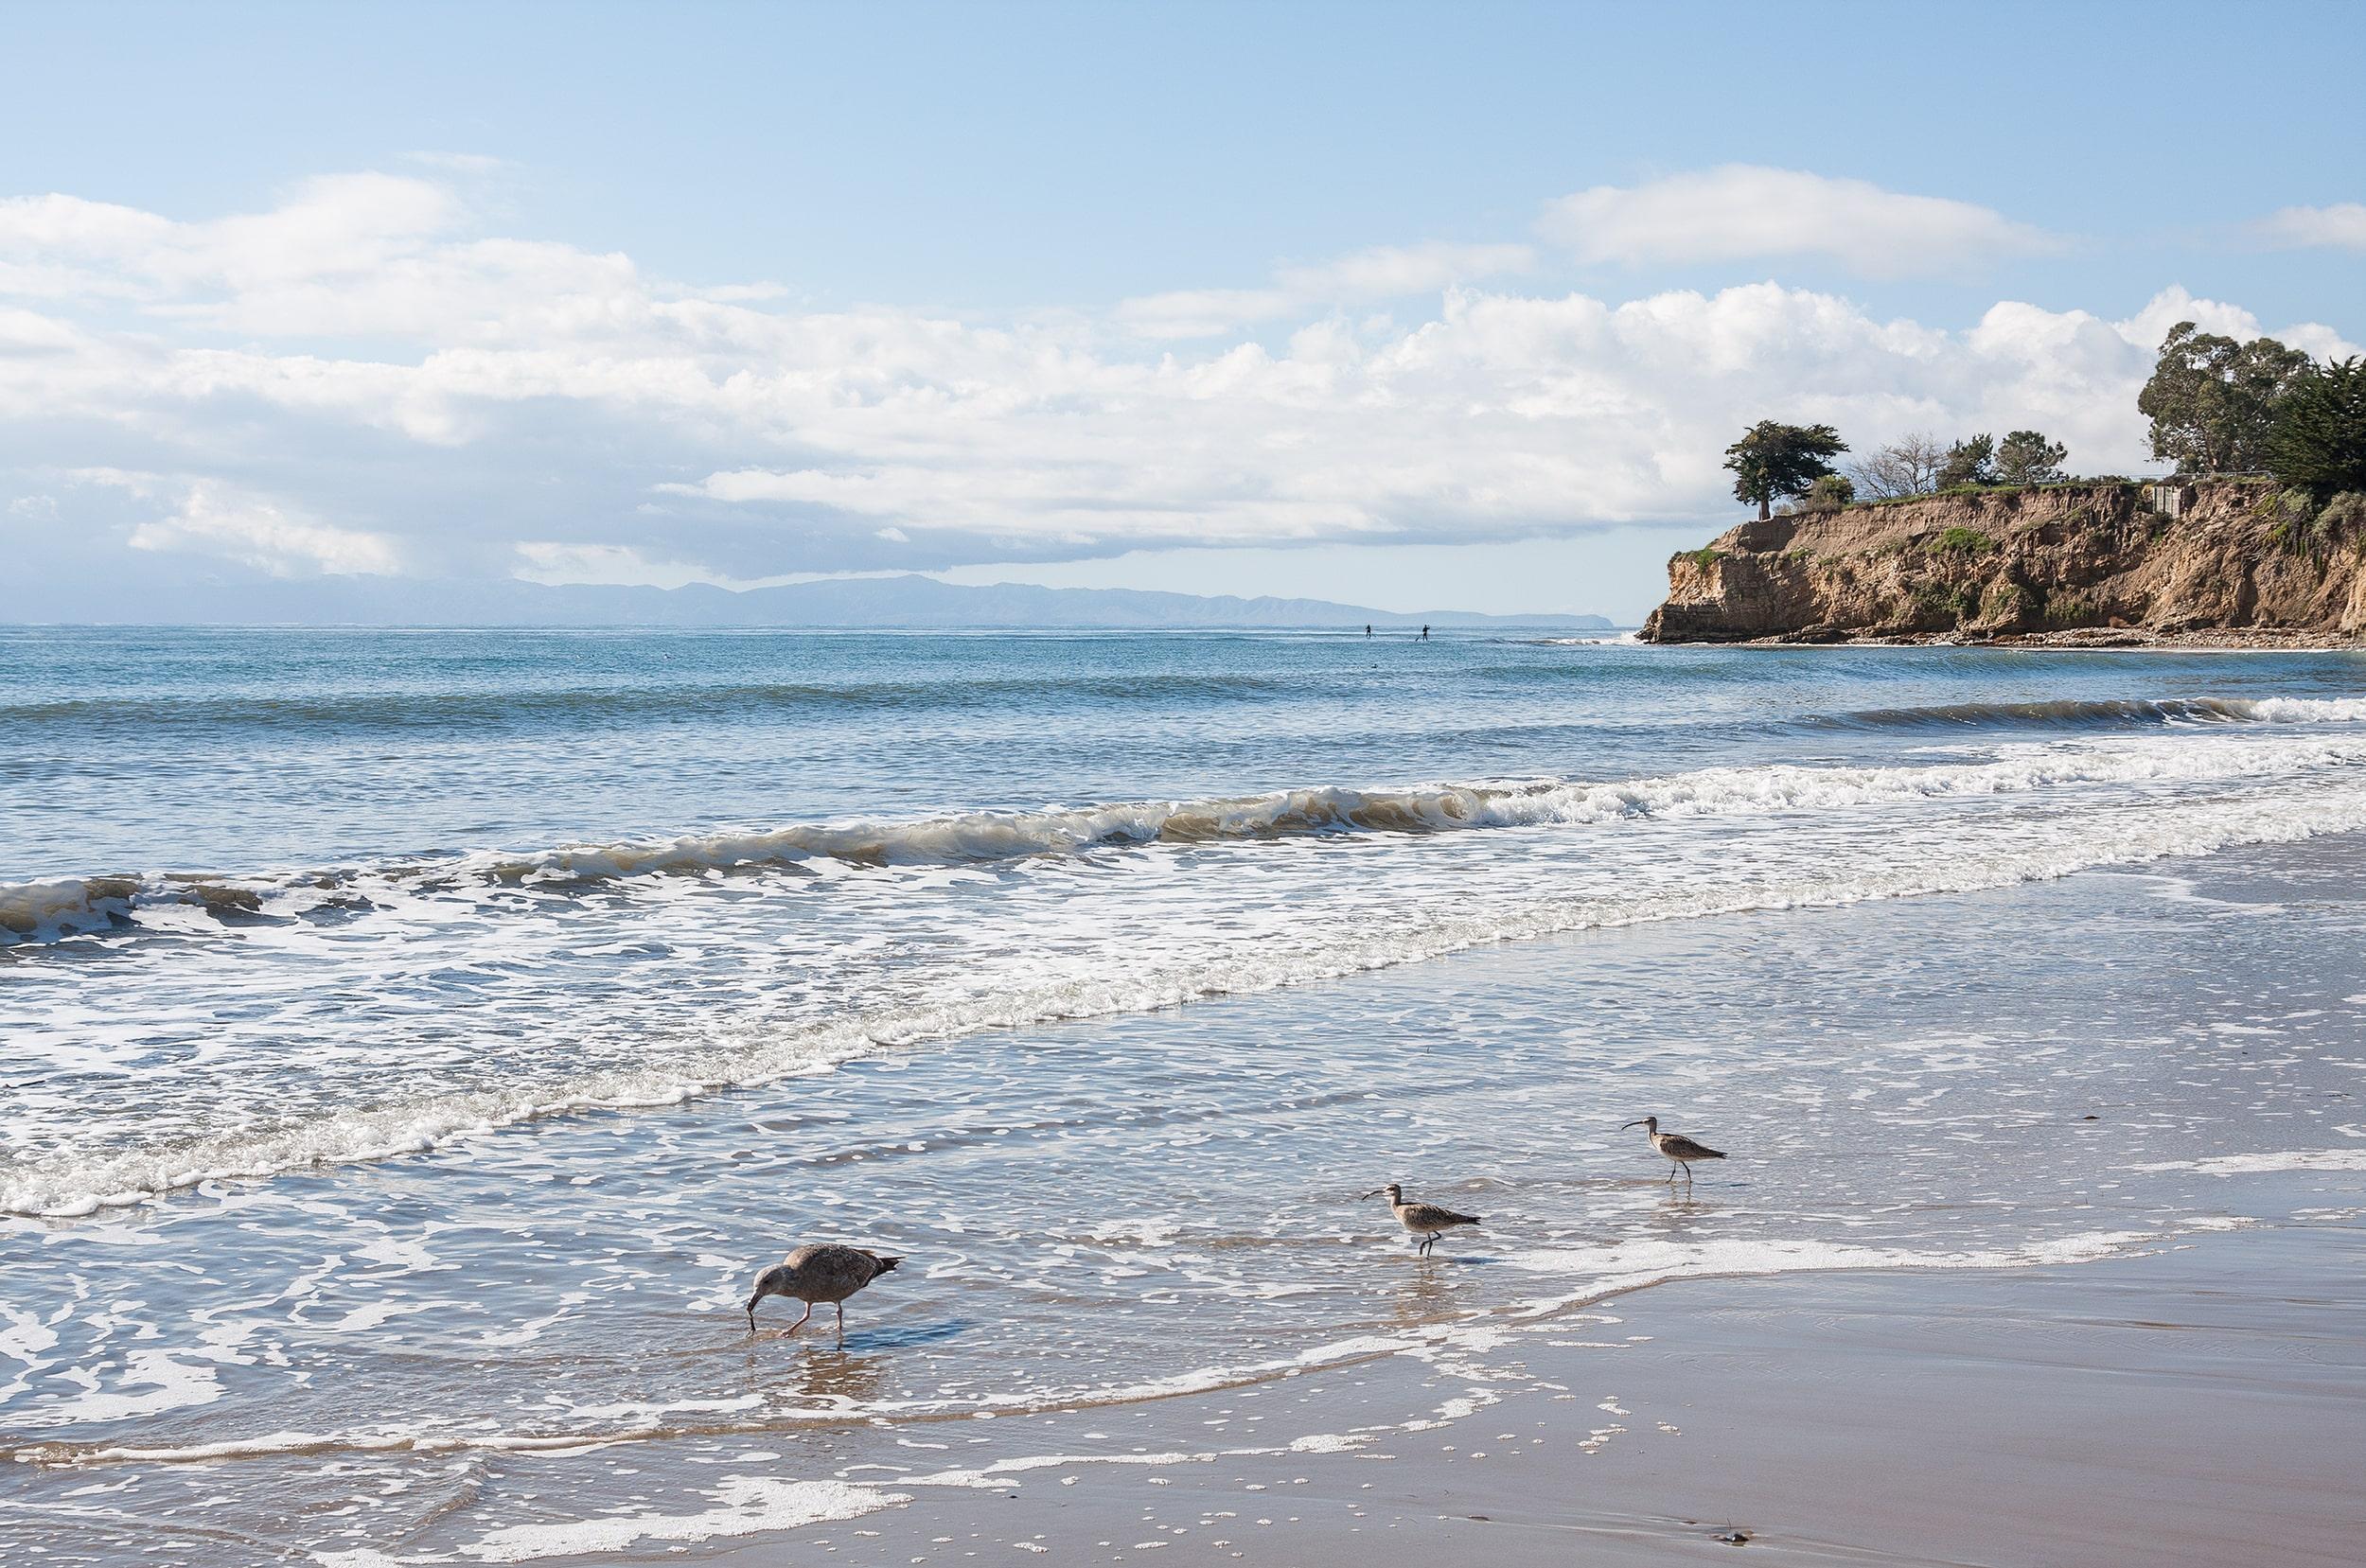 Surfing Santa Barbara - Leadbetter Beach